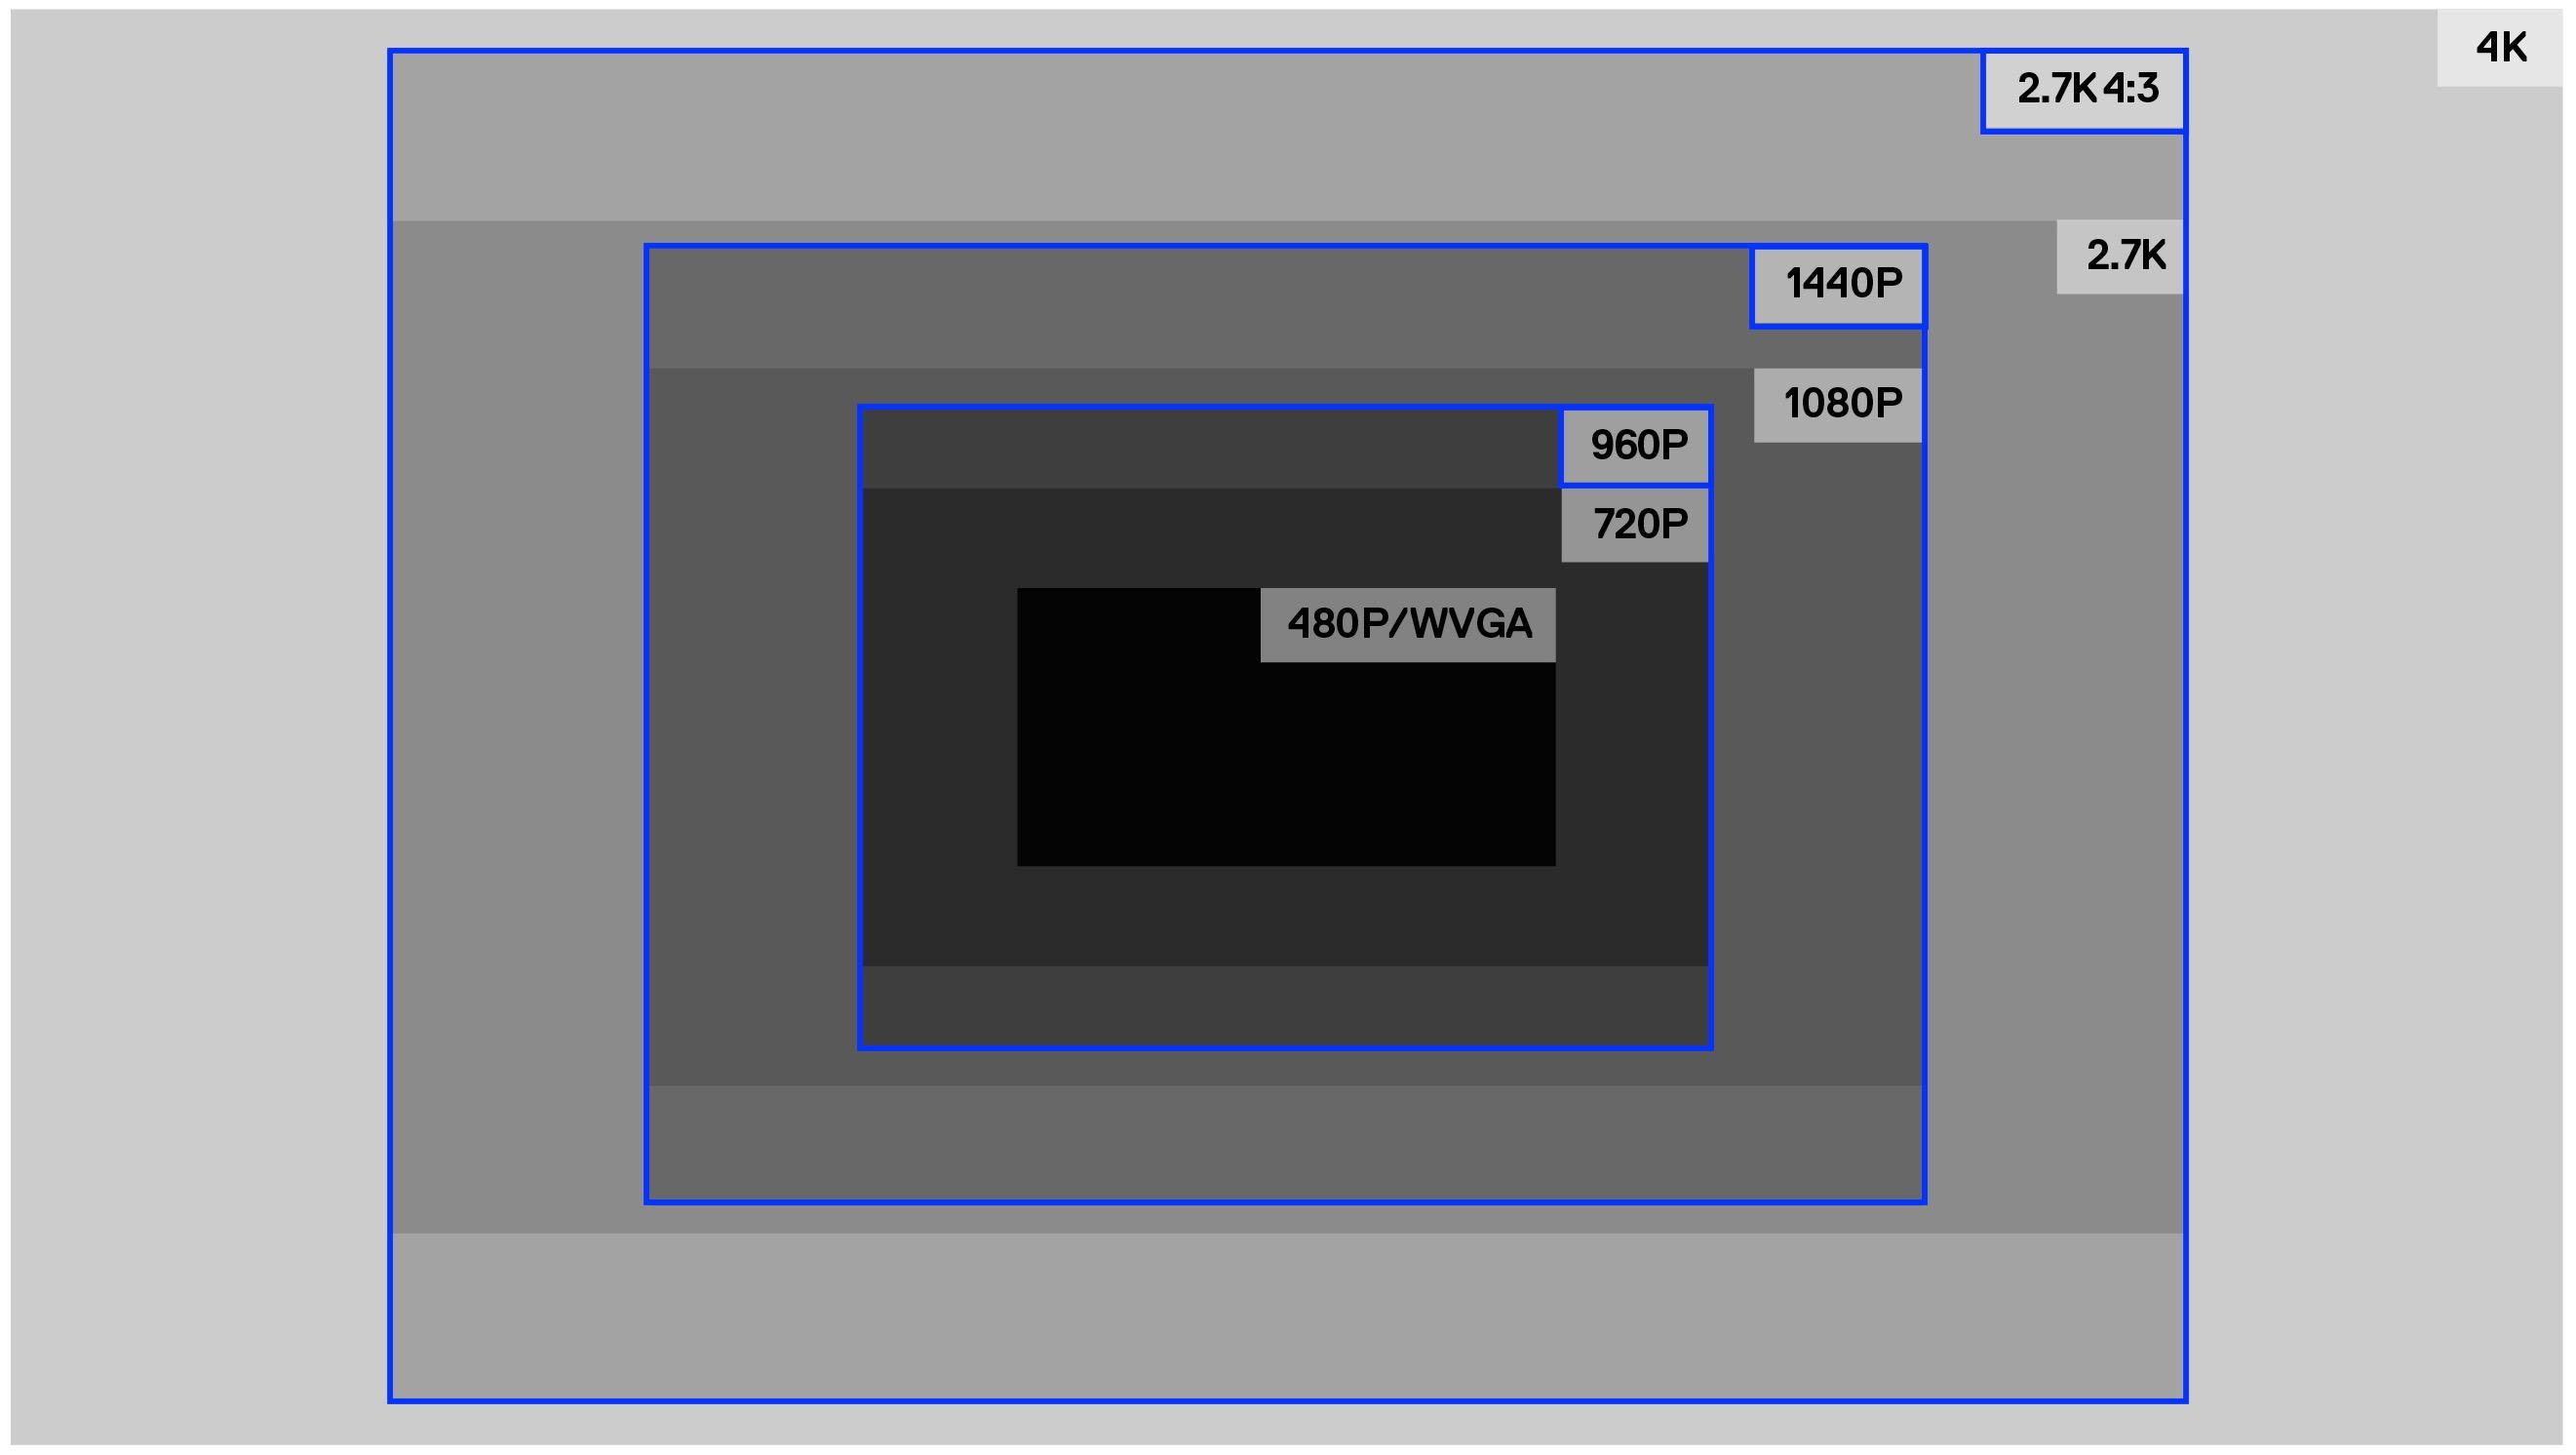 Video Resolutions for HERO7 Cameras